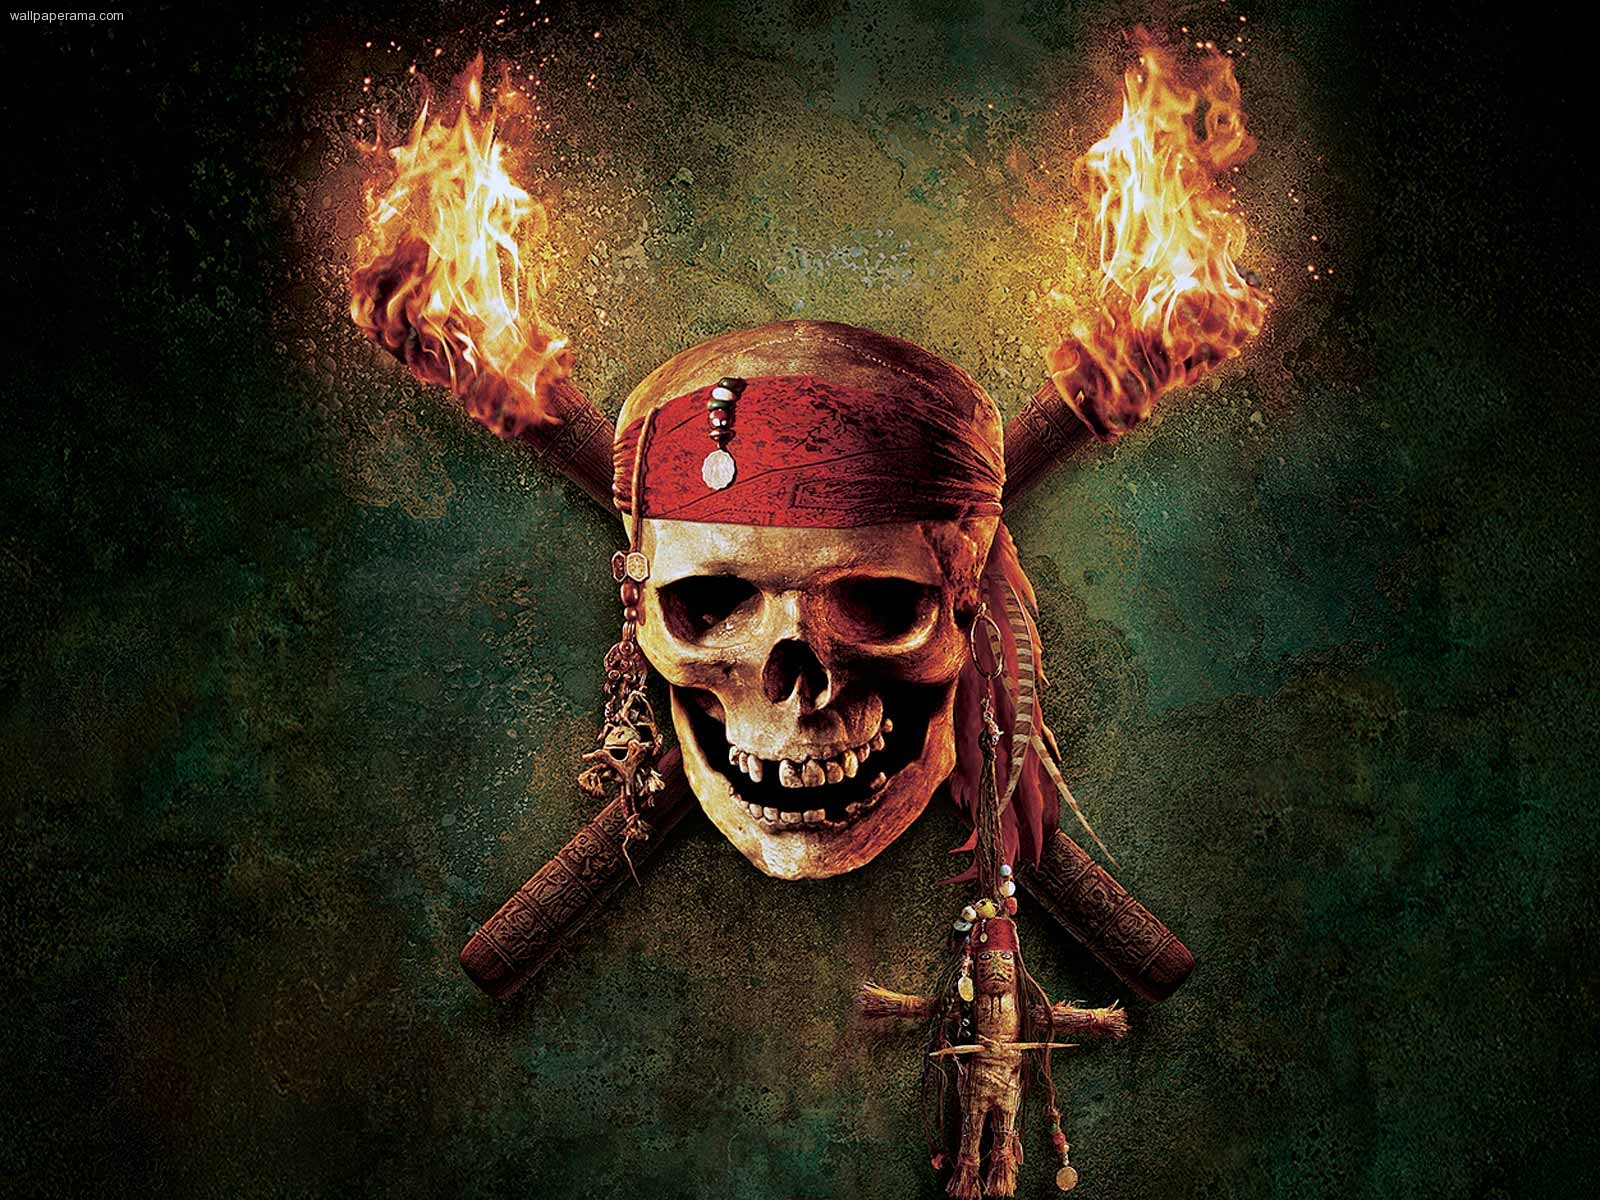 21p-8277-pirates-of-the-caribbean-4.jpg